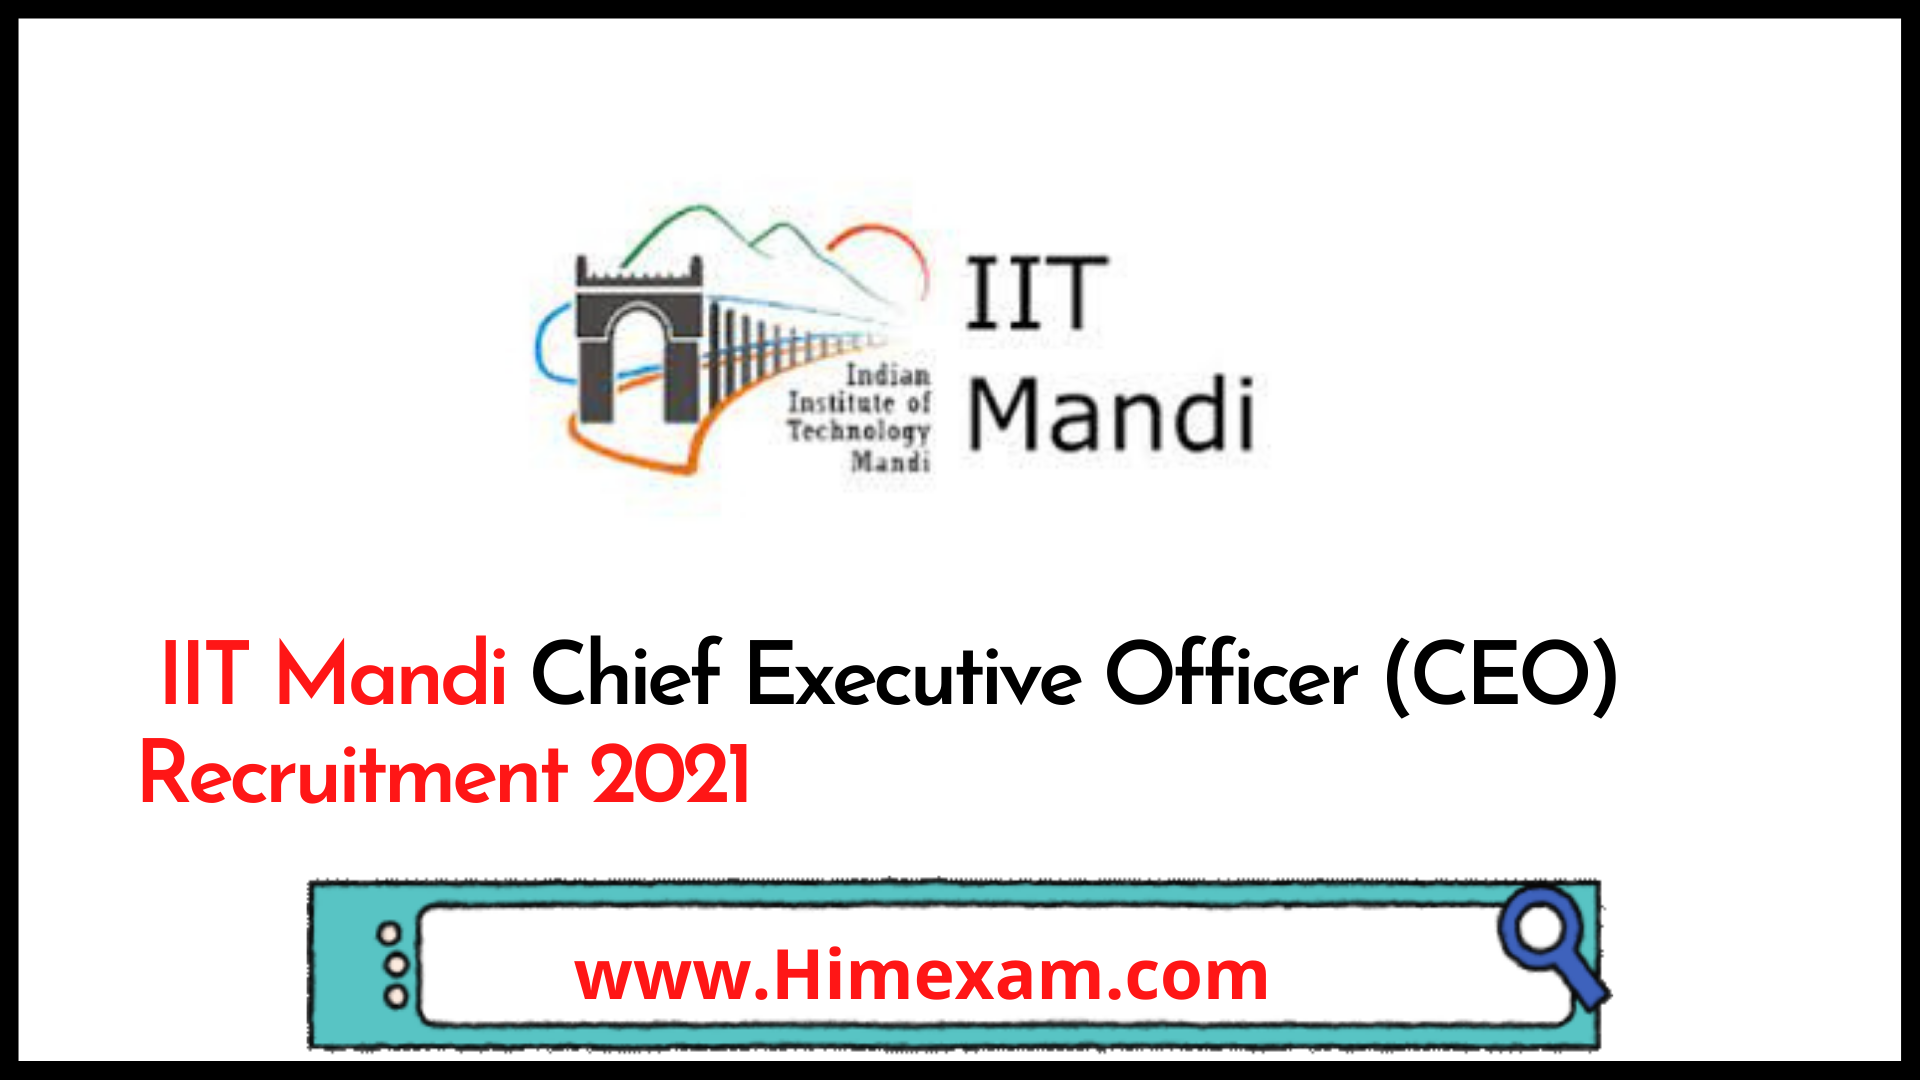 IIT Mandi Chief Executive Officer (CEO) Recruitment 2021